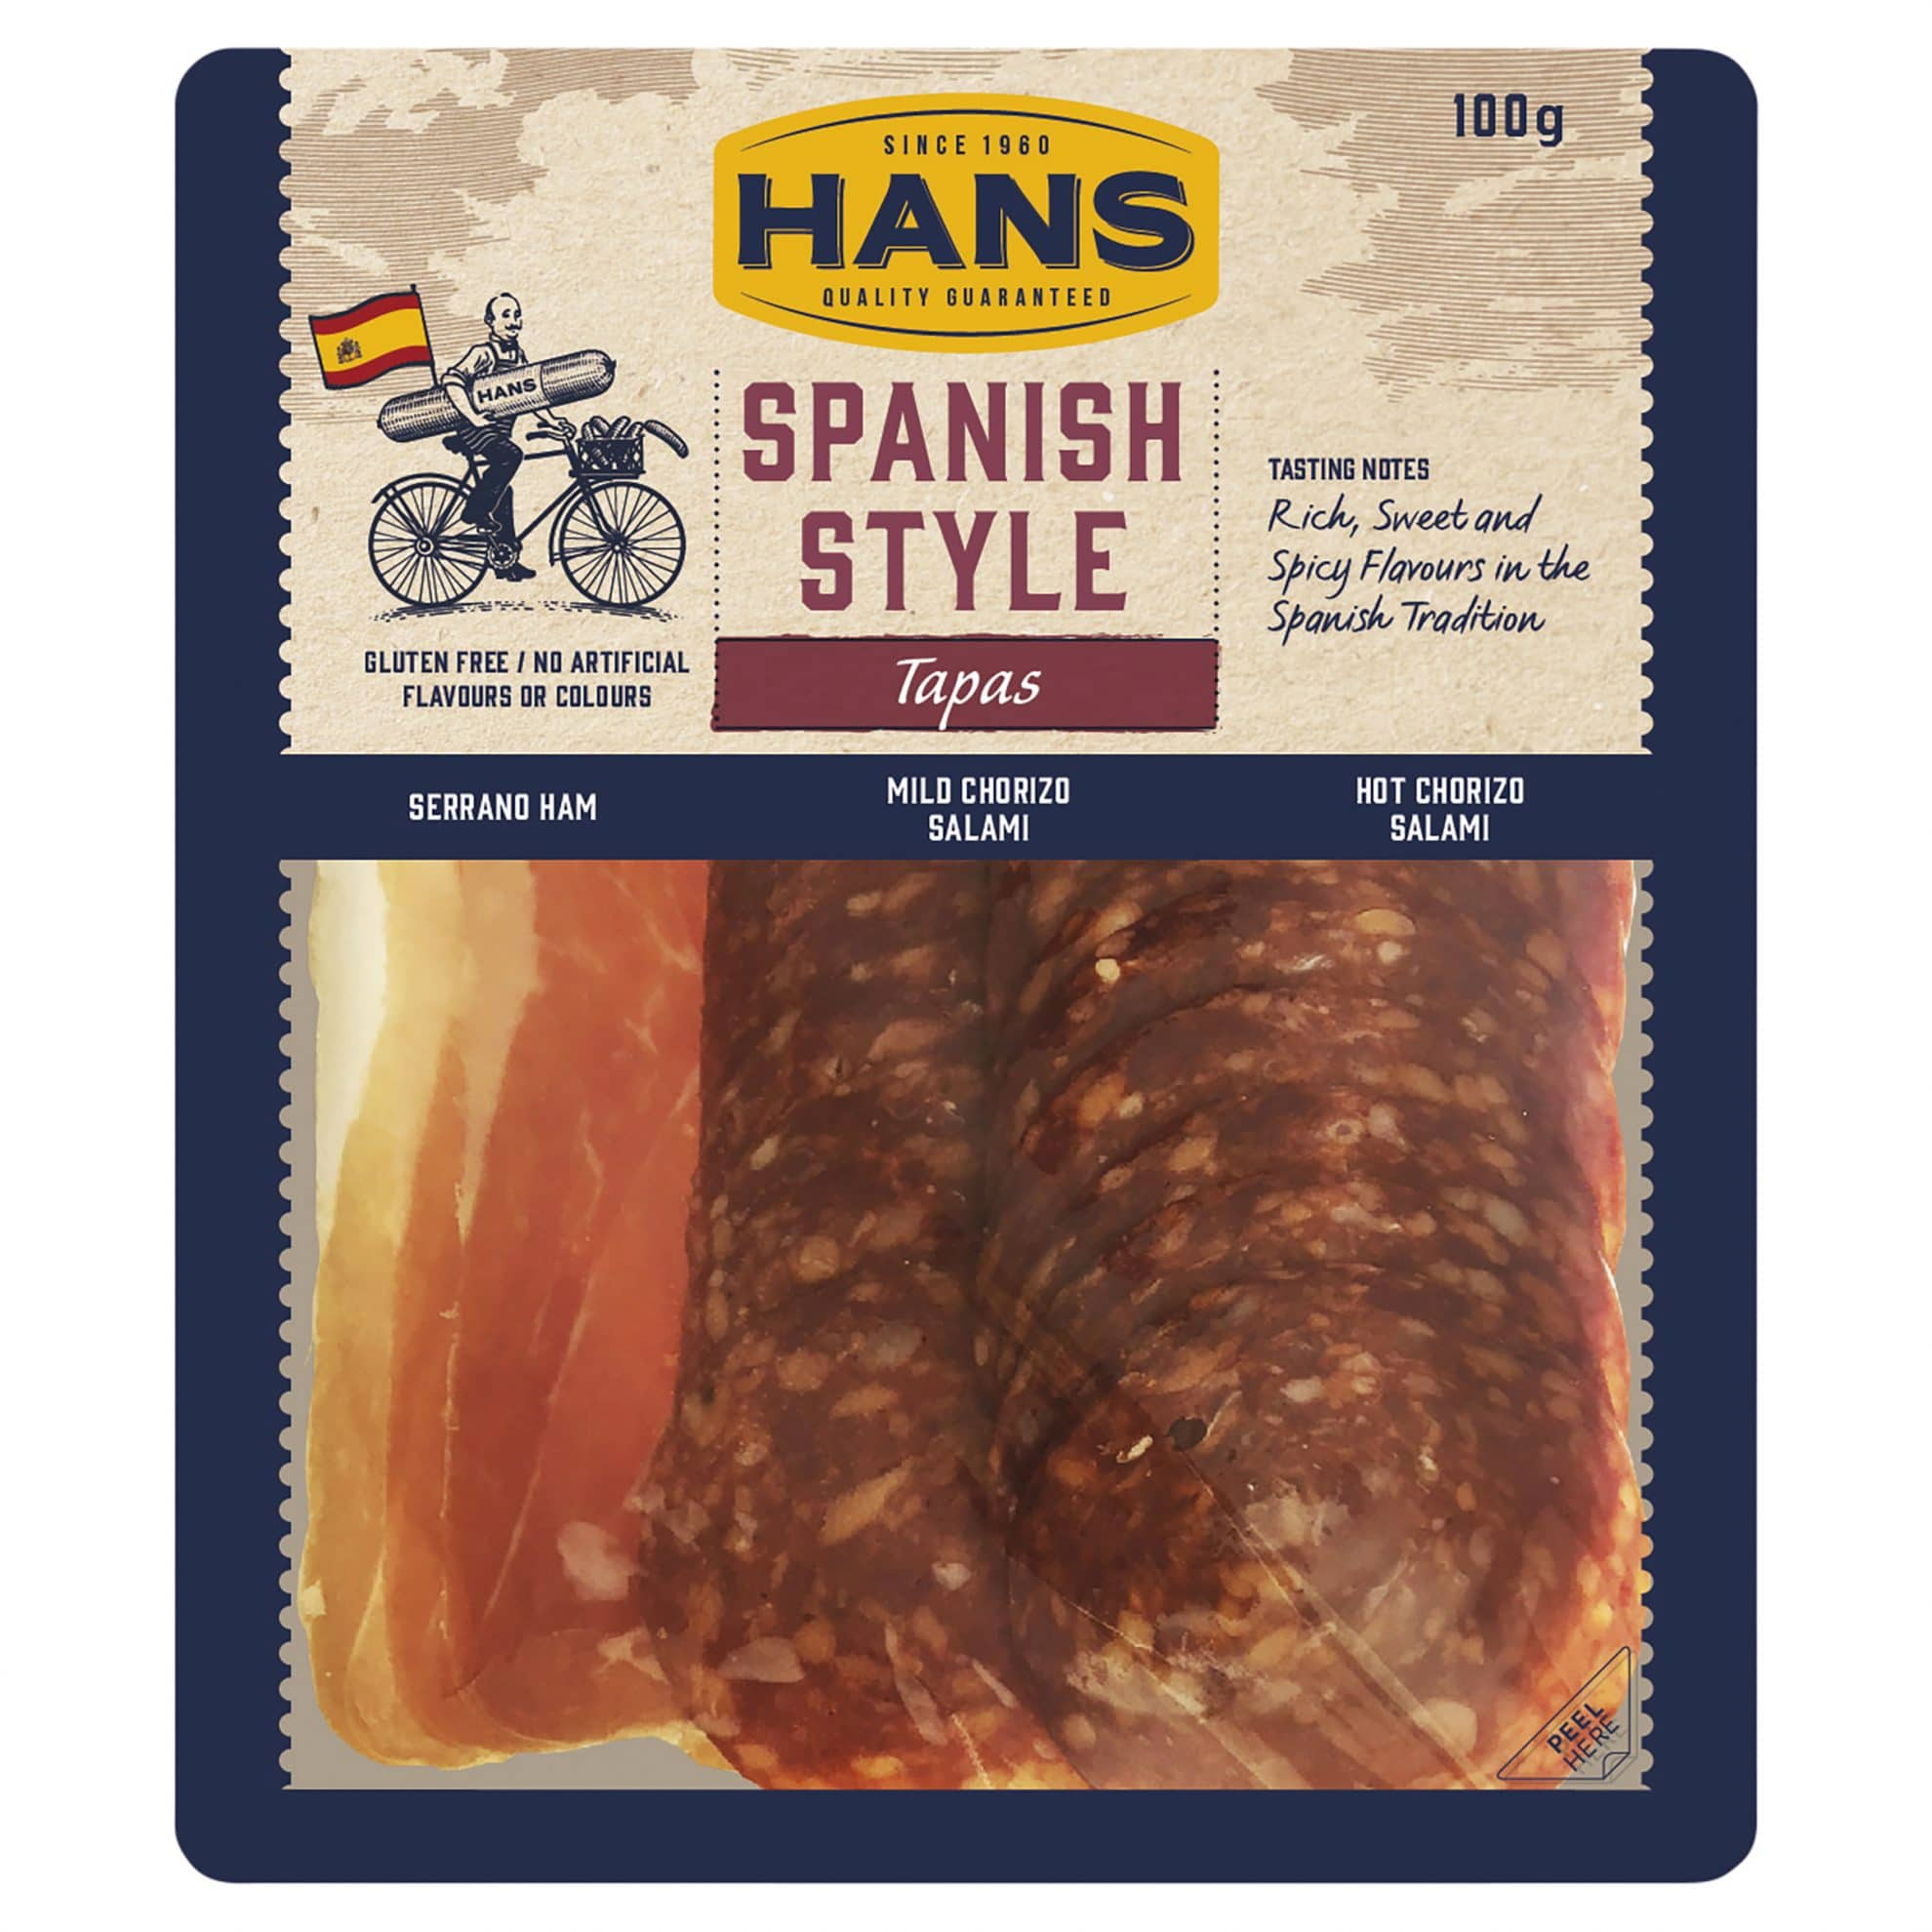 Hans Spanish Style Tapas 100g